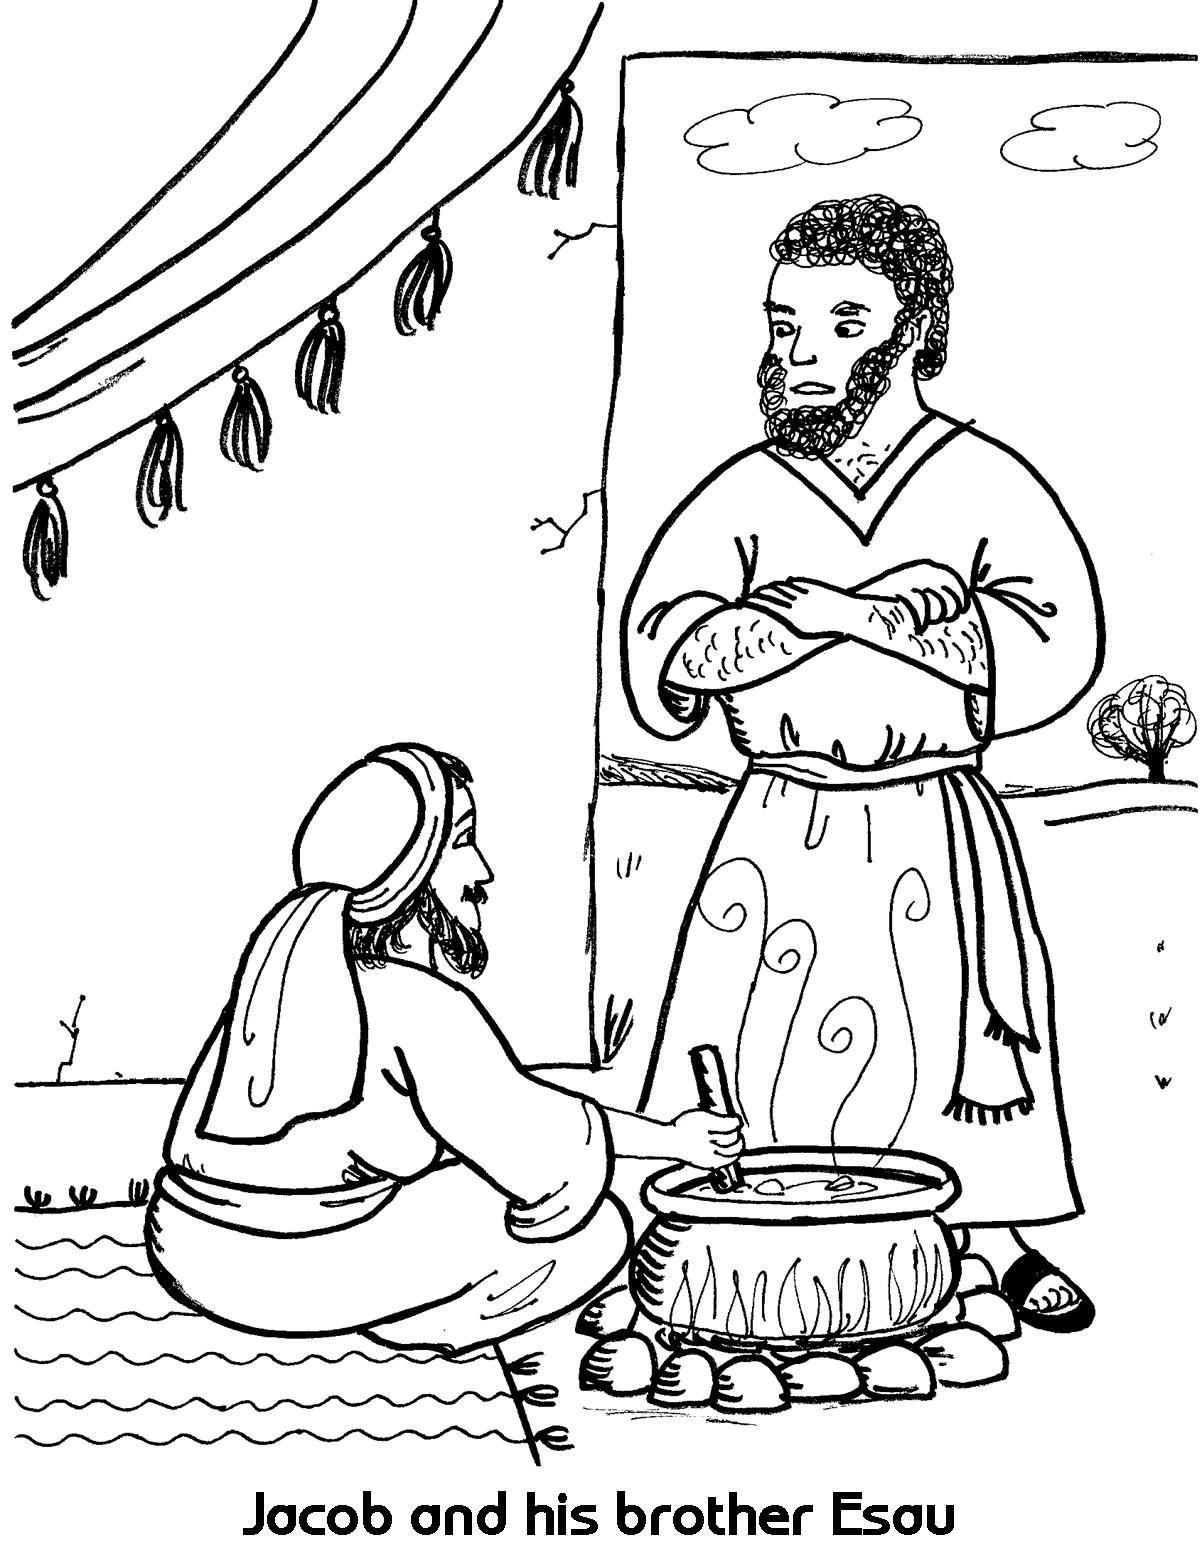 Jacob And His Brother Esau